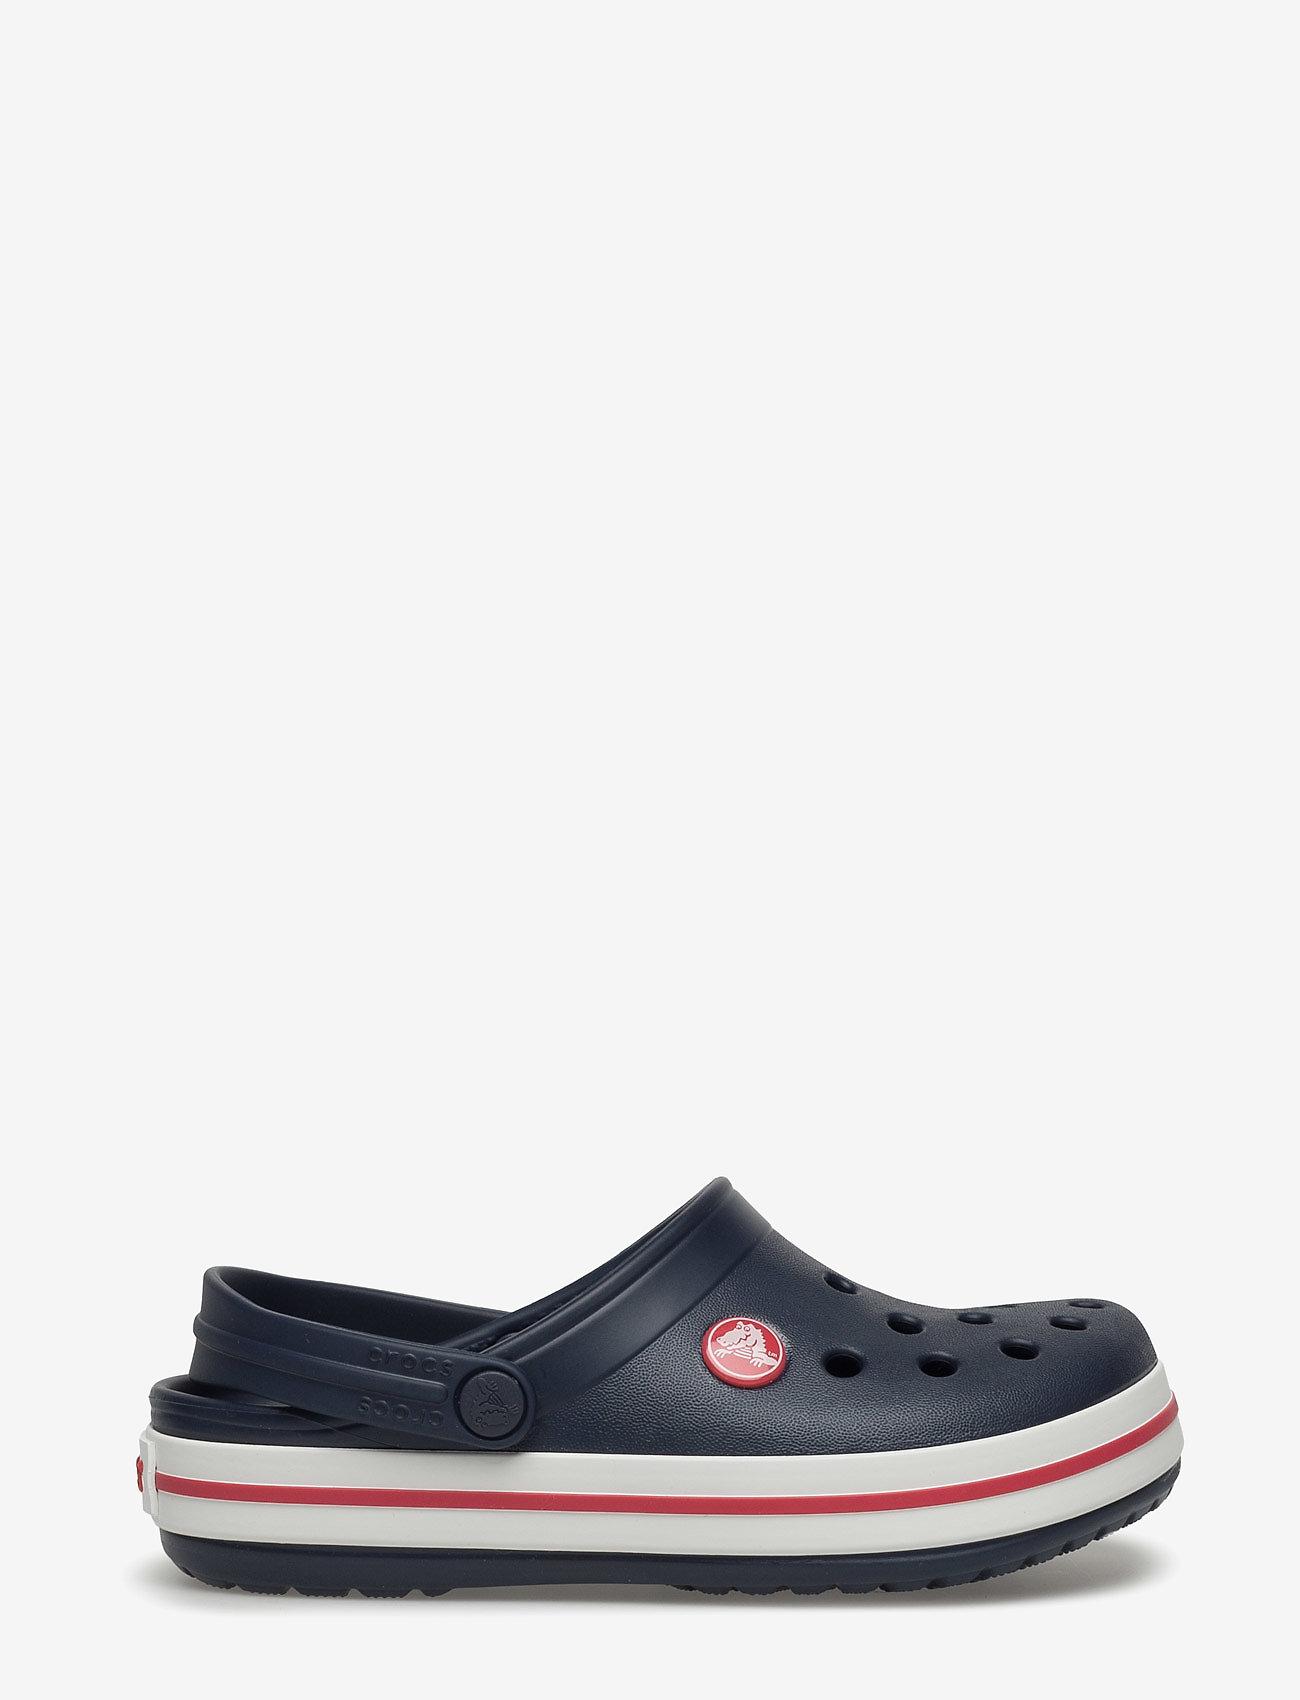 Crocs - Crocband Clog K - navy/red - 1